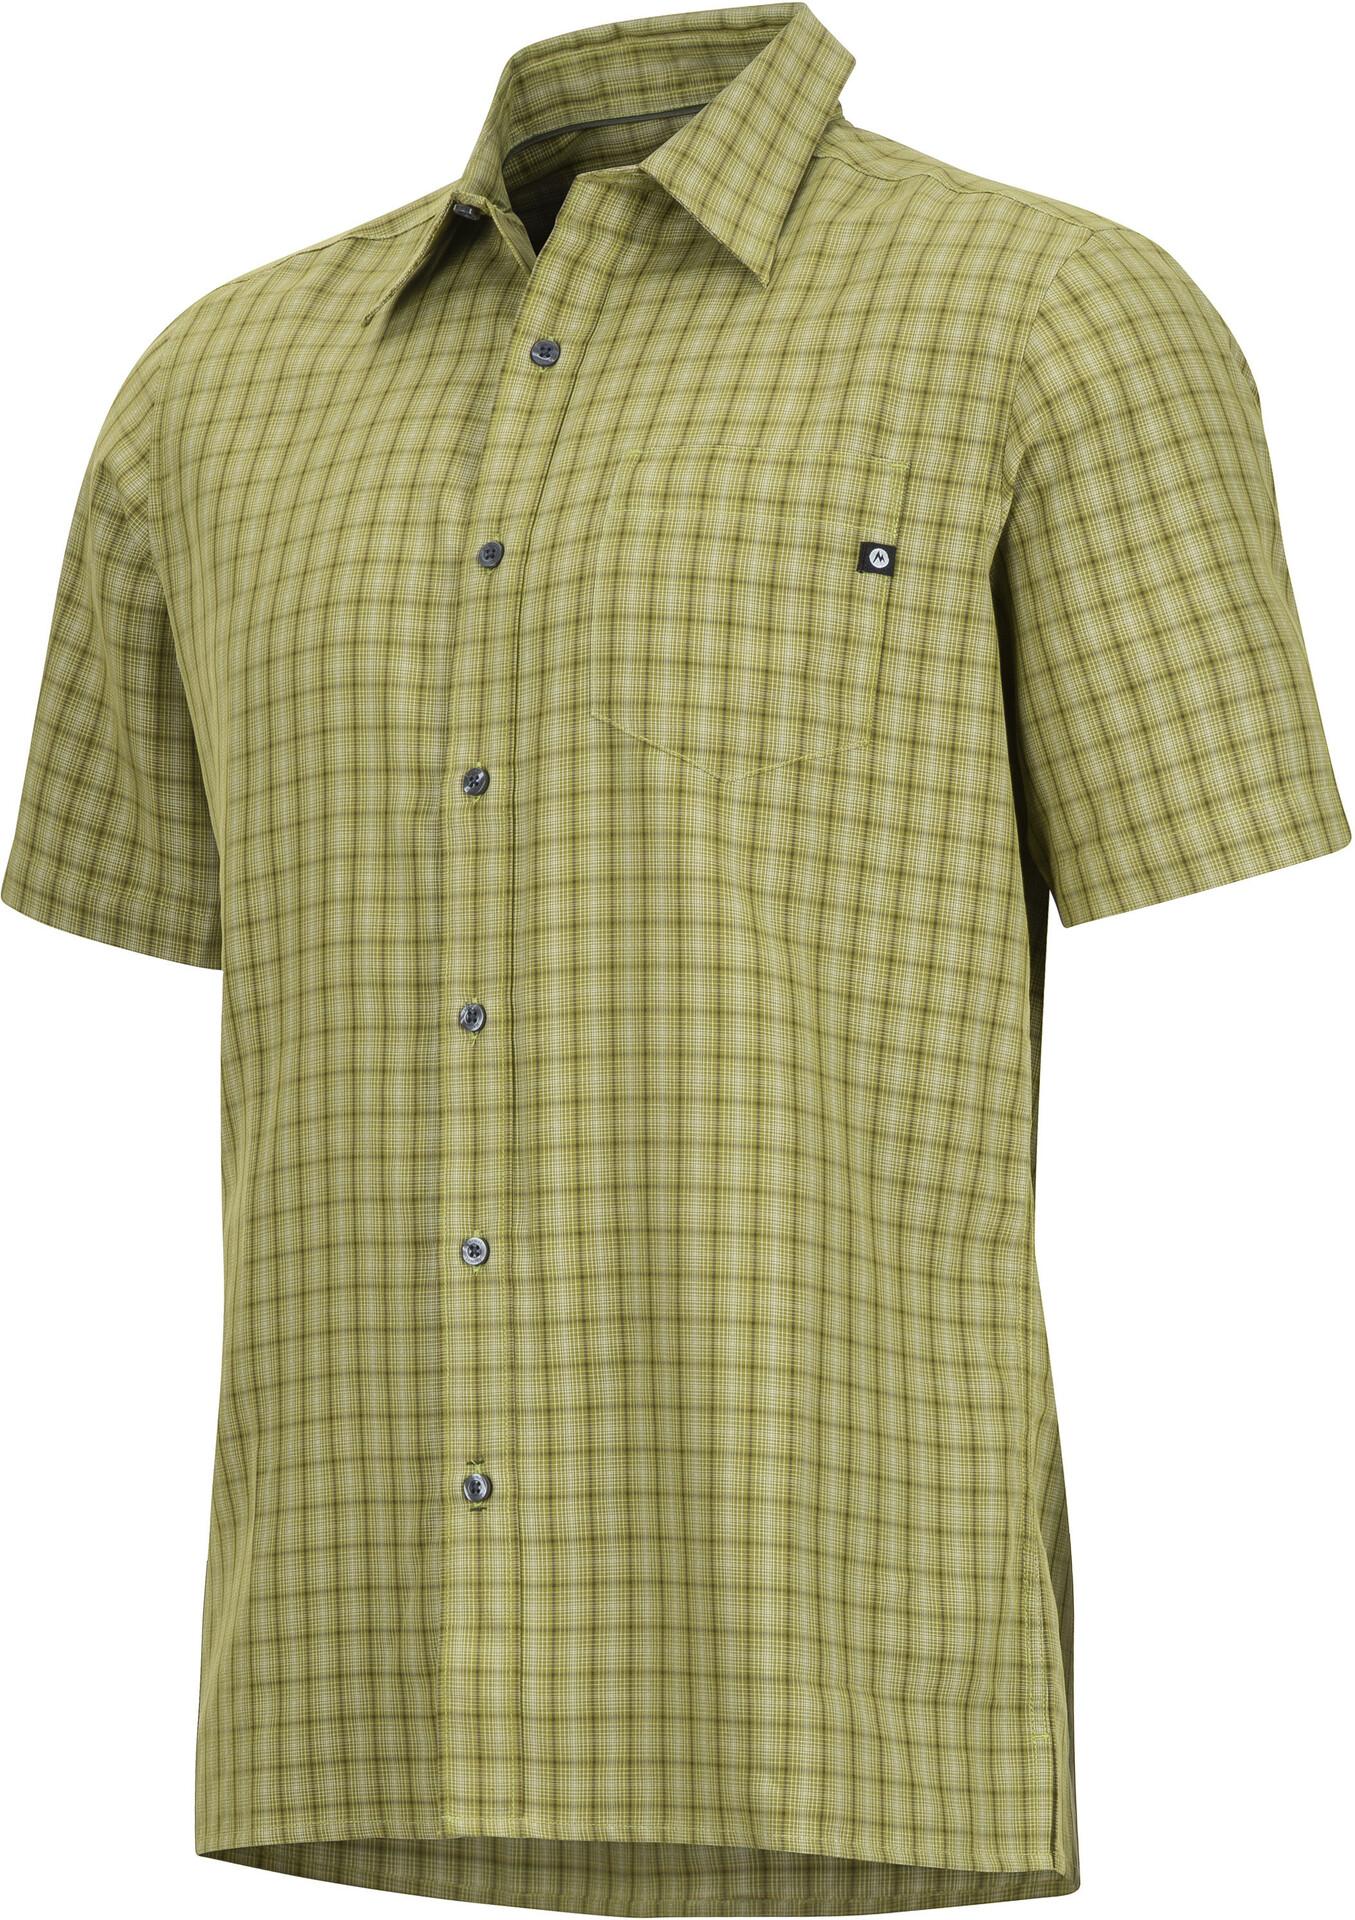 Marmot M's Eldridge SS Shirt Shirt Shirt Wheatgrass 8e8d39